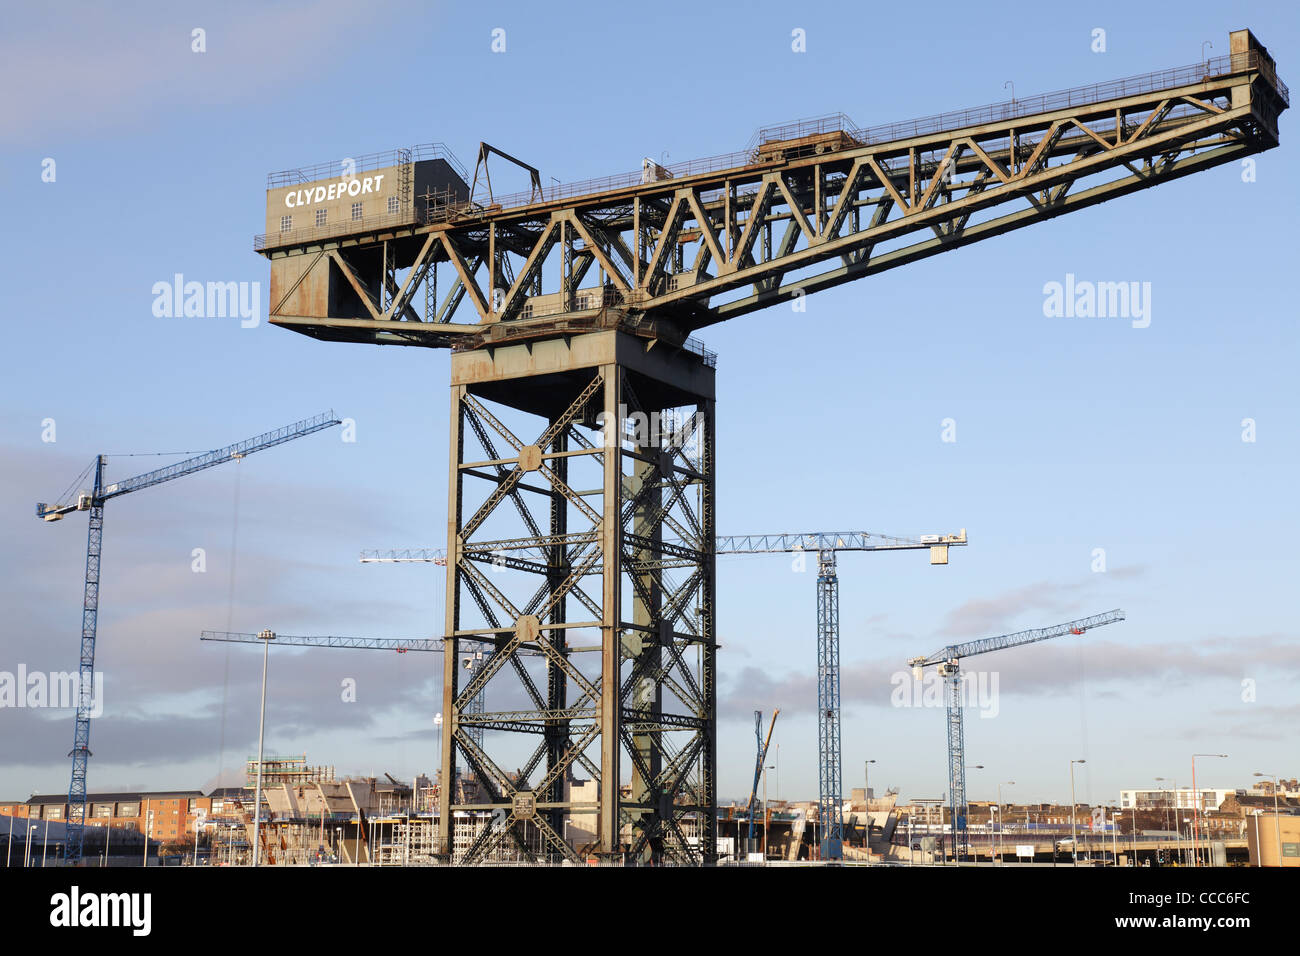 Construction cranes beside the Finnieston Crane in Glasgow, Scotland, UK - Stock Image